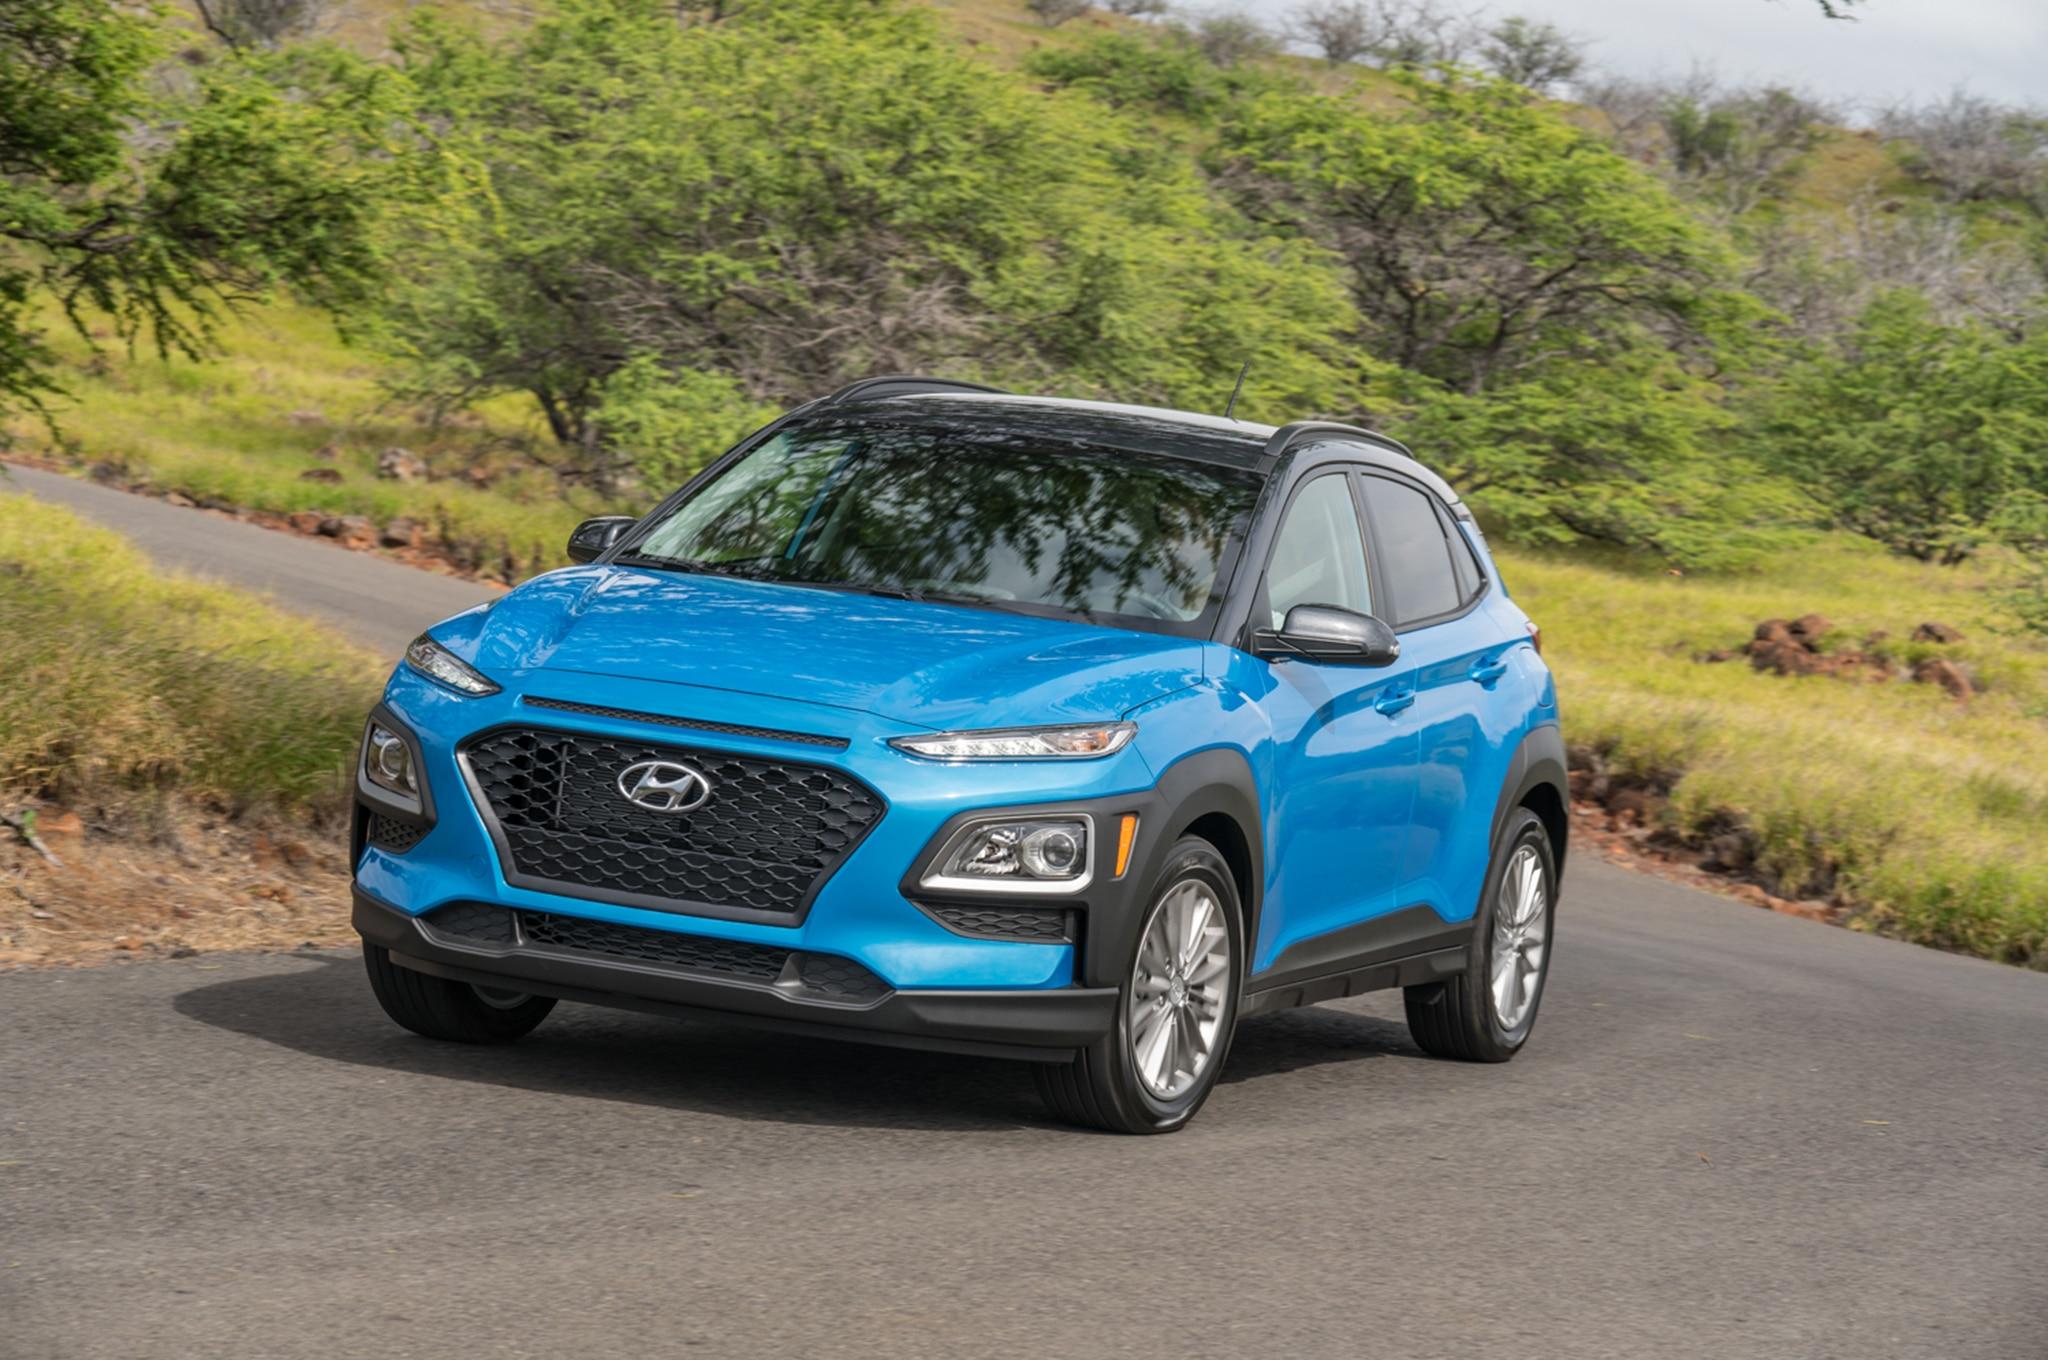 2018 Hyundai Kona Front Three Quarter 7